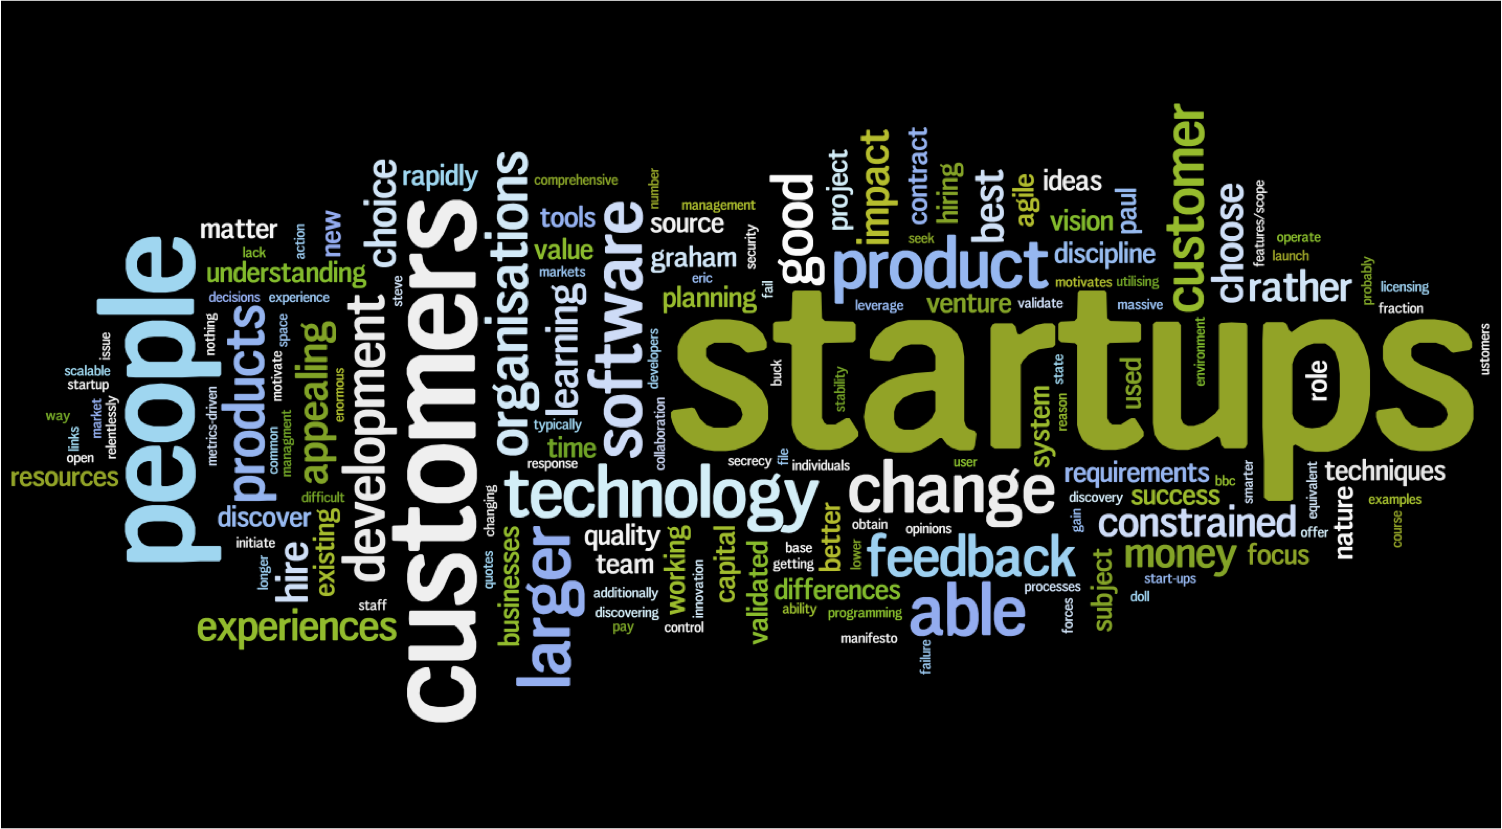 startup problems